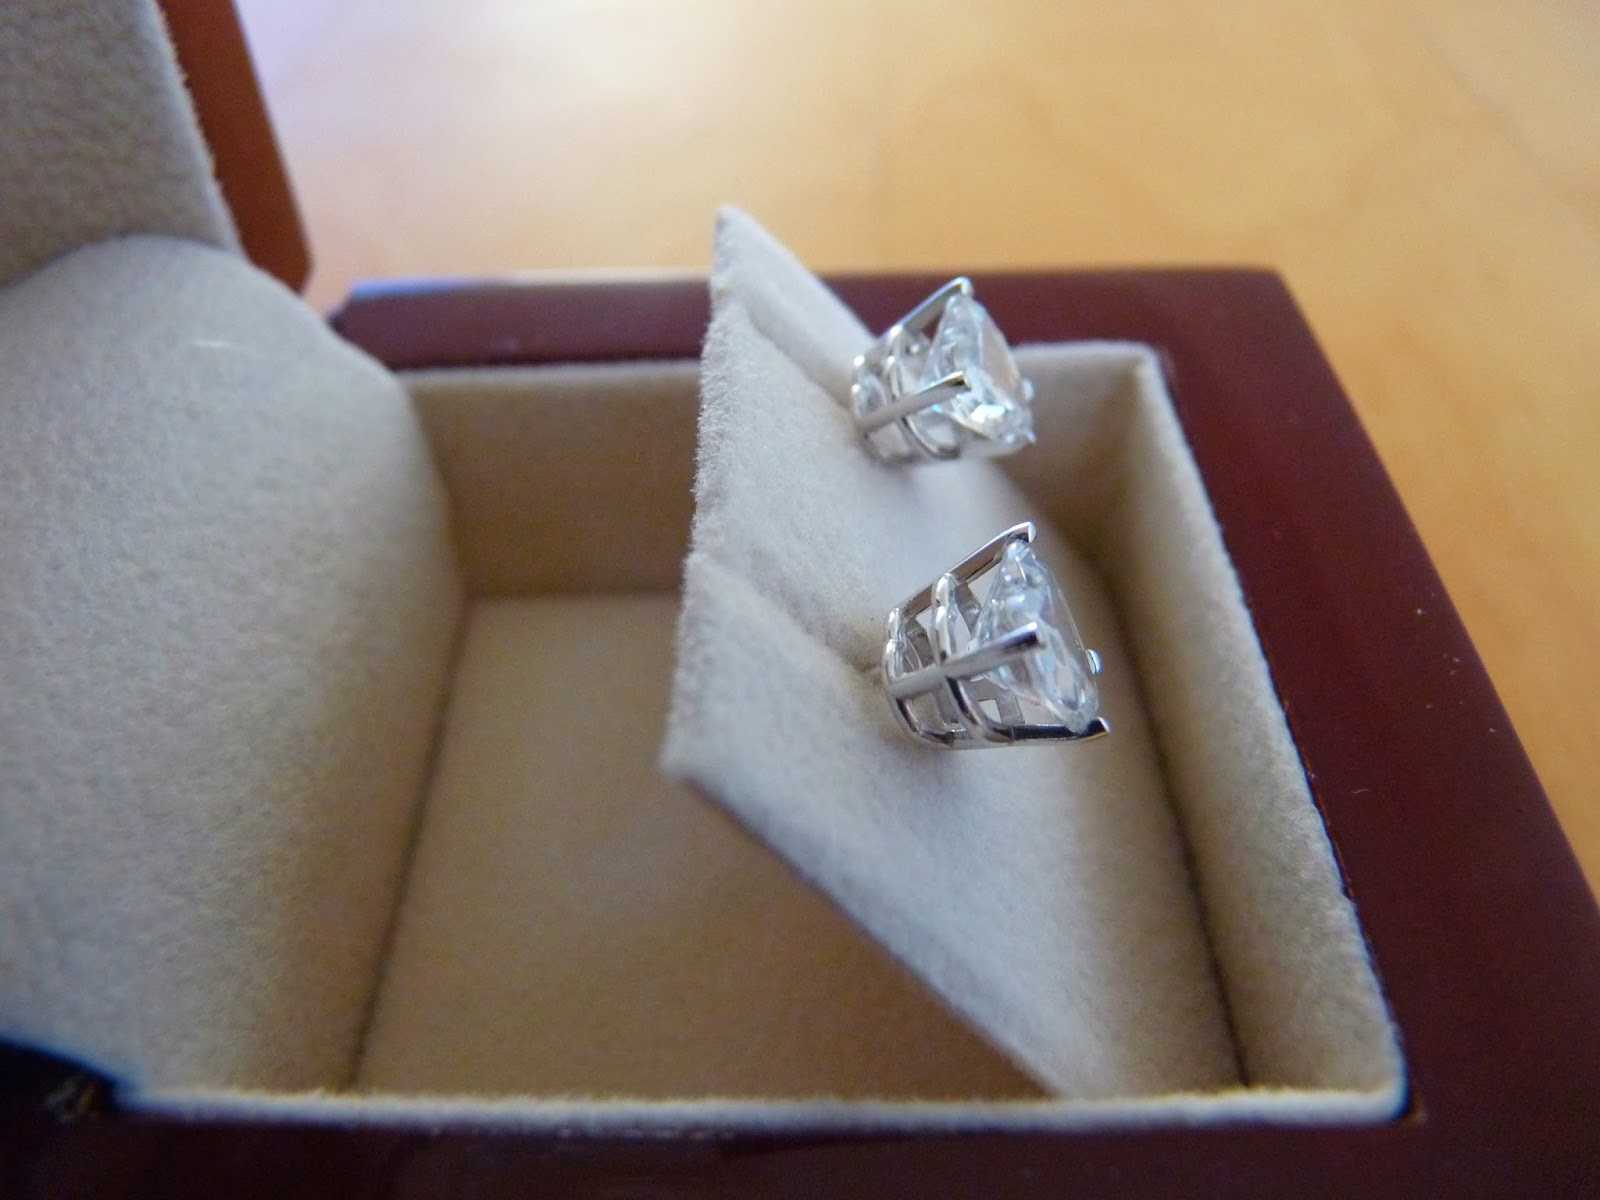 Diamond Nexus Earrings Mark Broumand 4 30ct Round Brilliant Cut